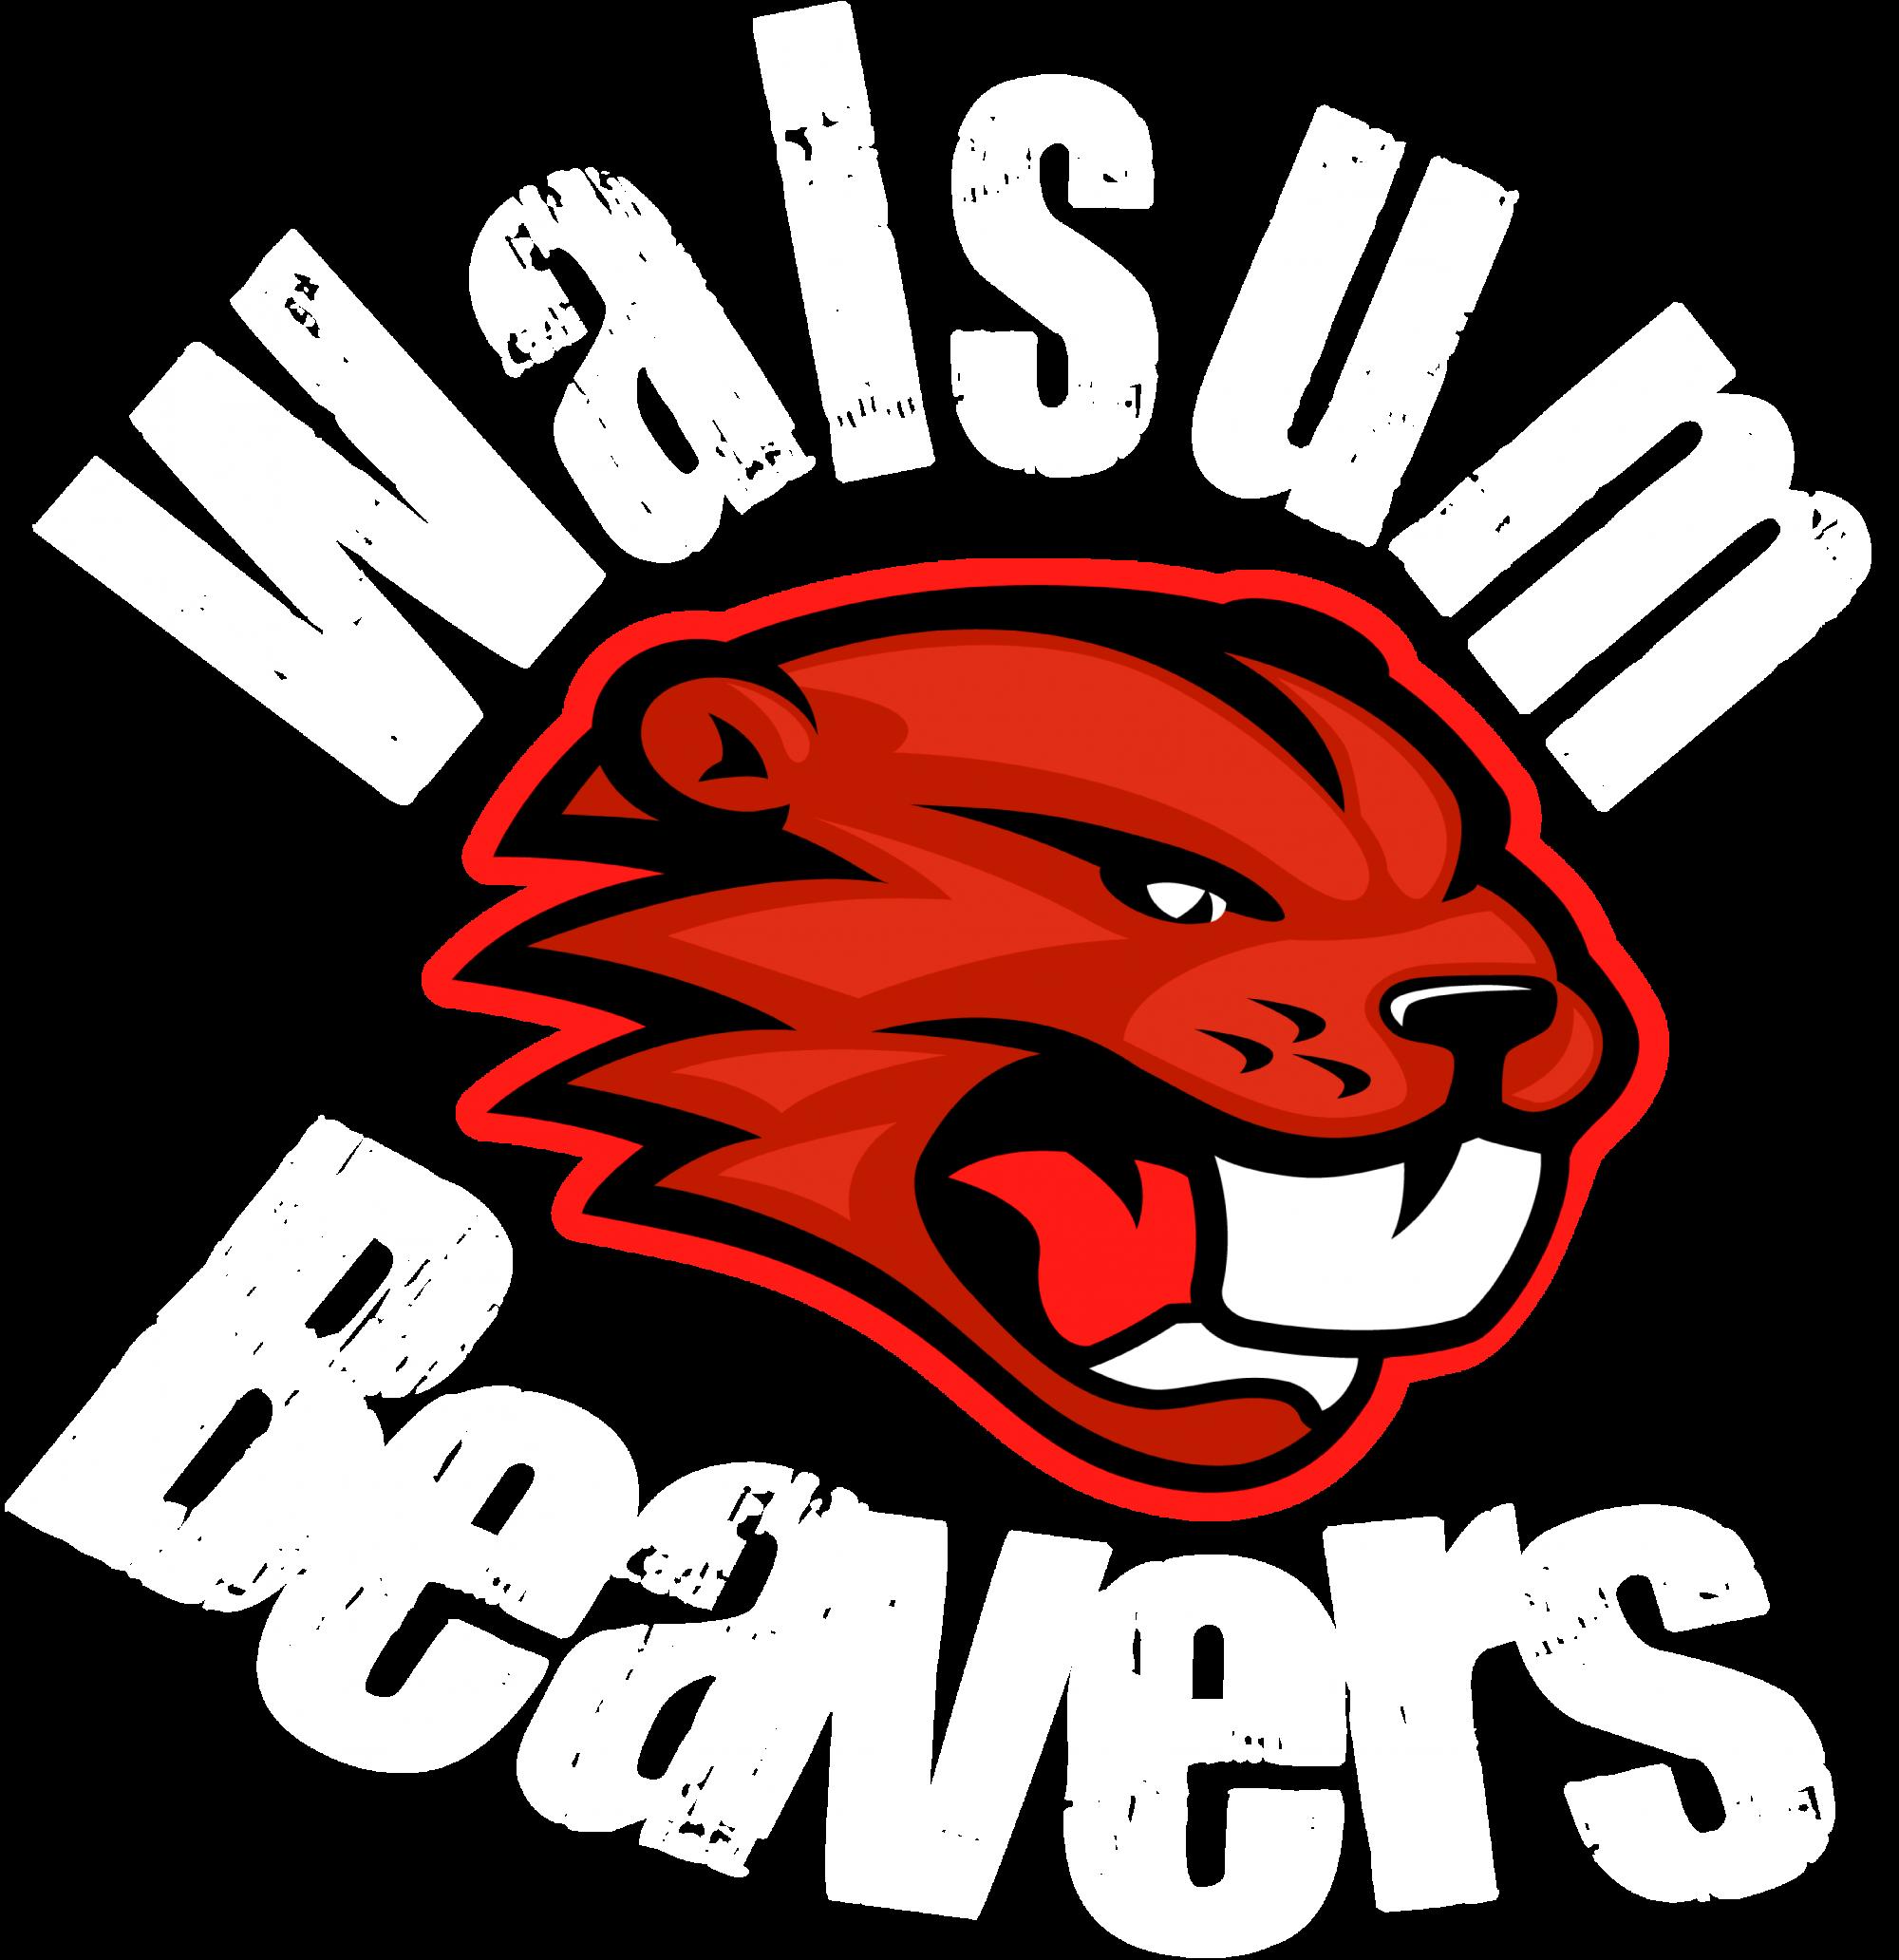 #WalsumBeavers